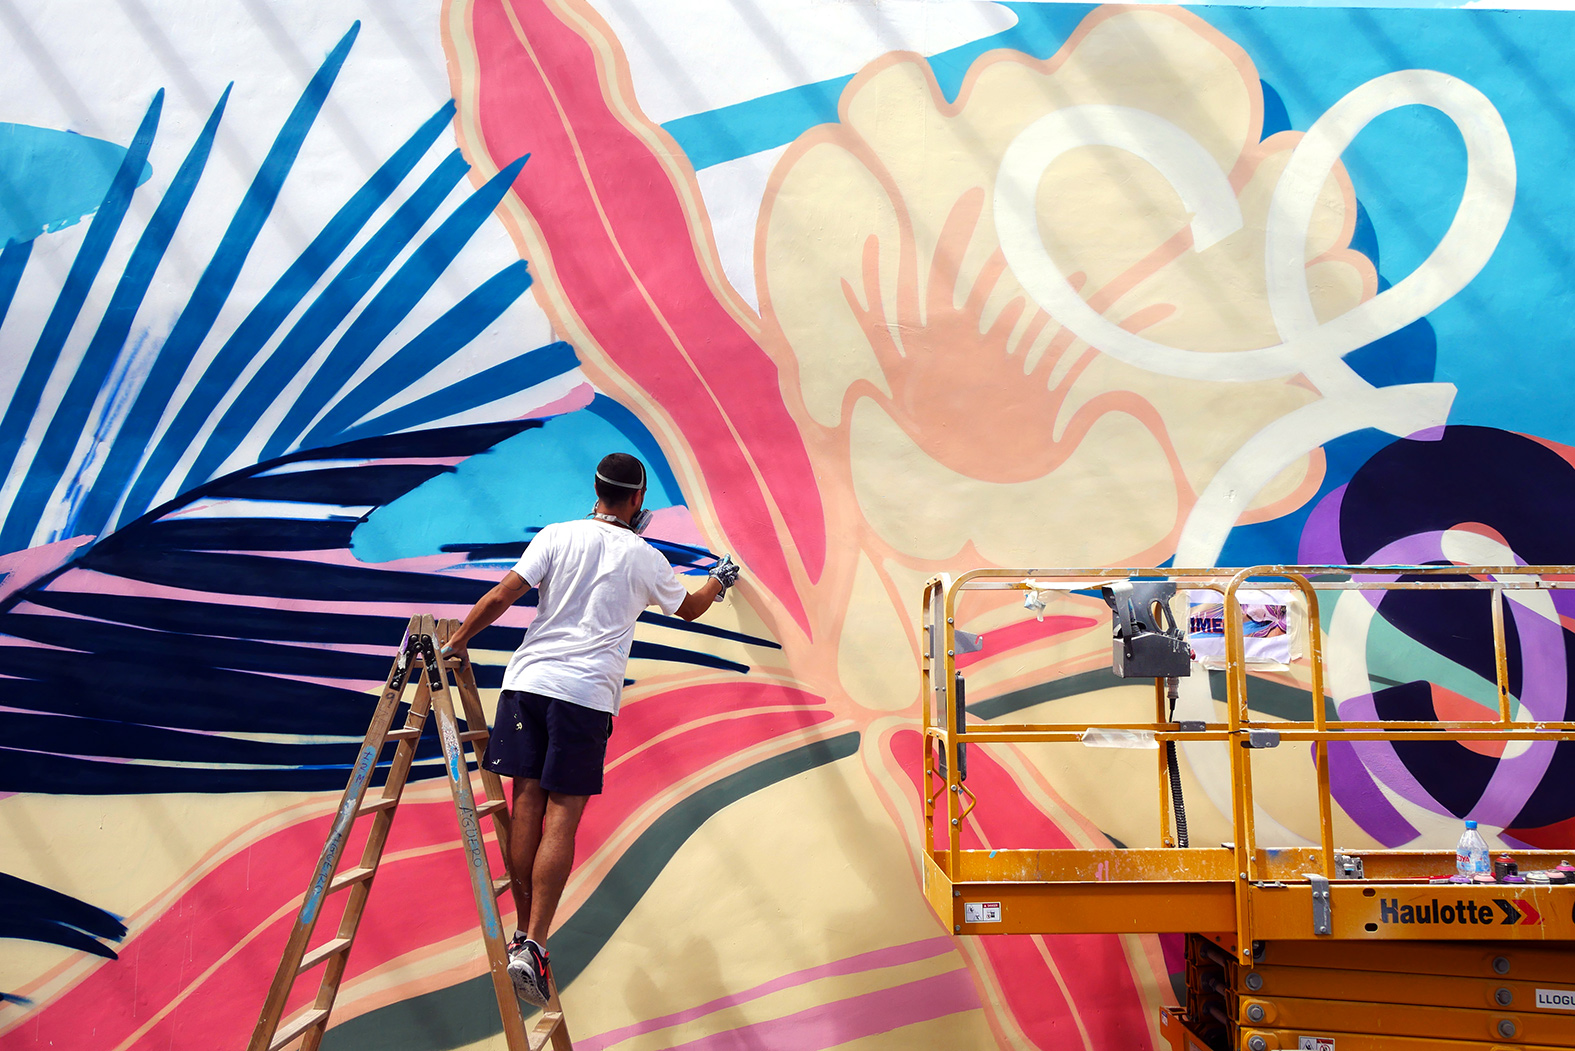 Nerone-W-hotel-painting-street-art-ibiza-17